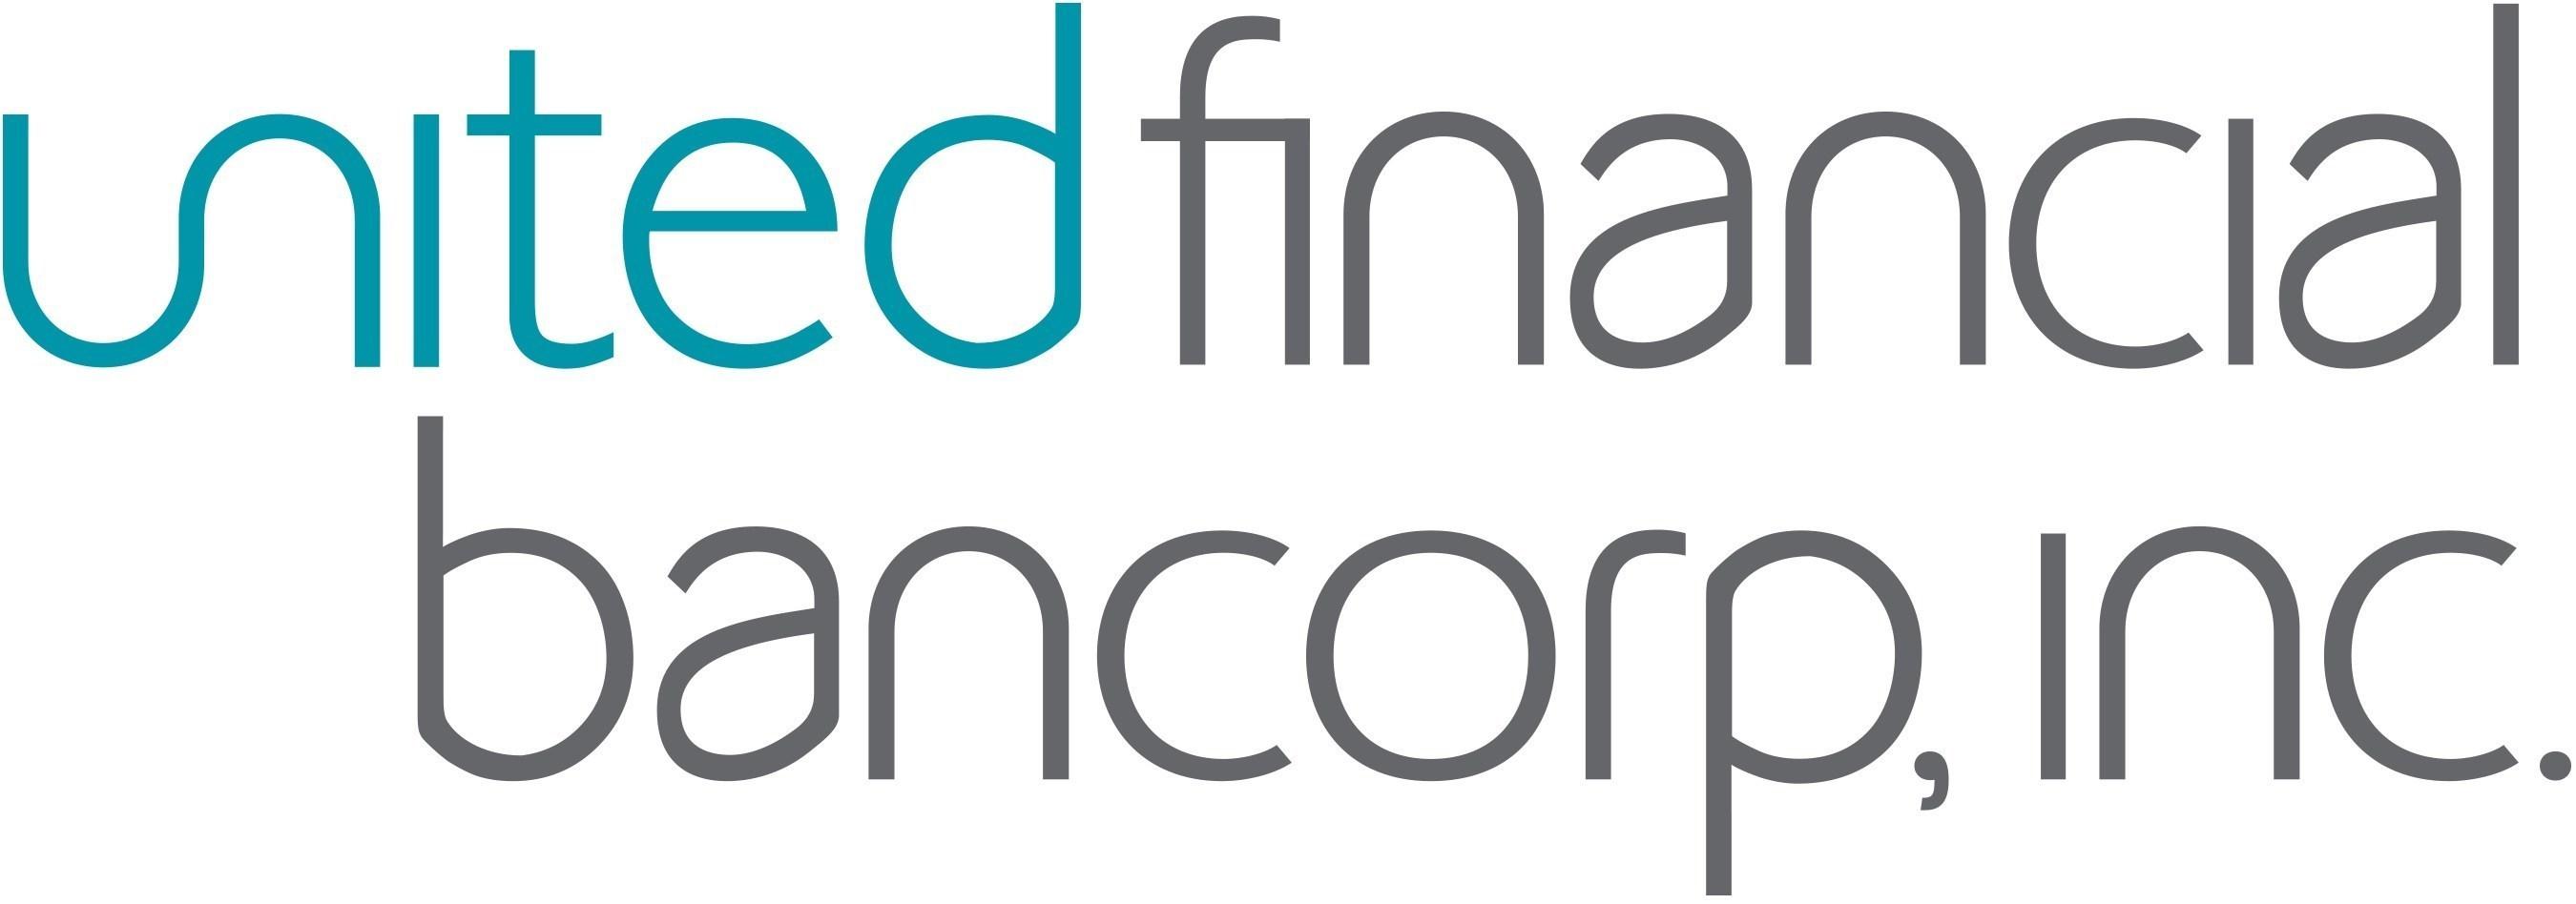 United Financial Bancorp, Inc.